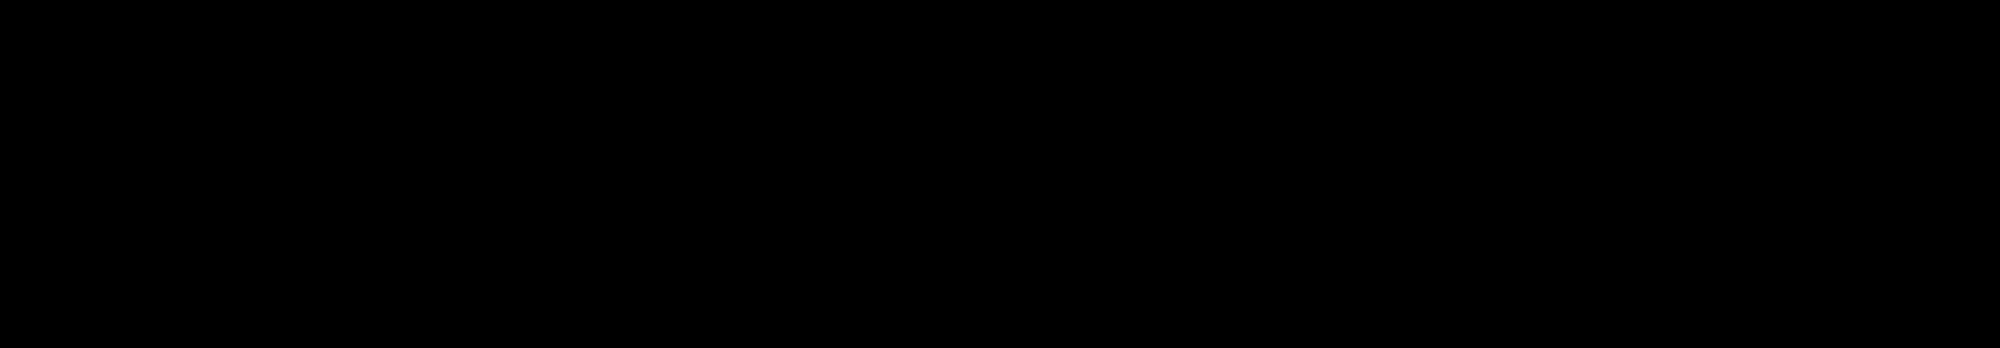 cm_logo_horizontal_black.png